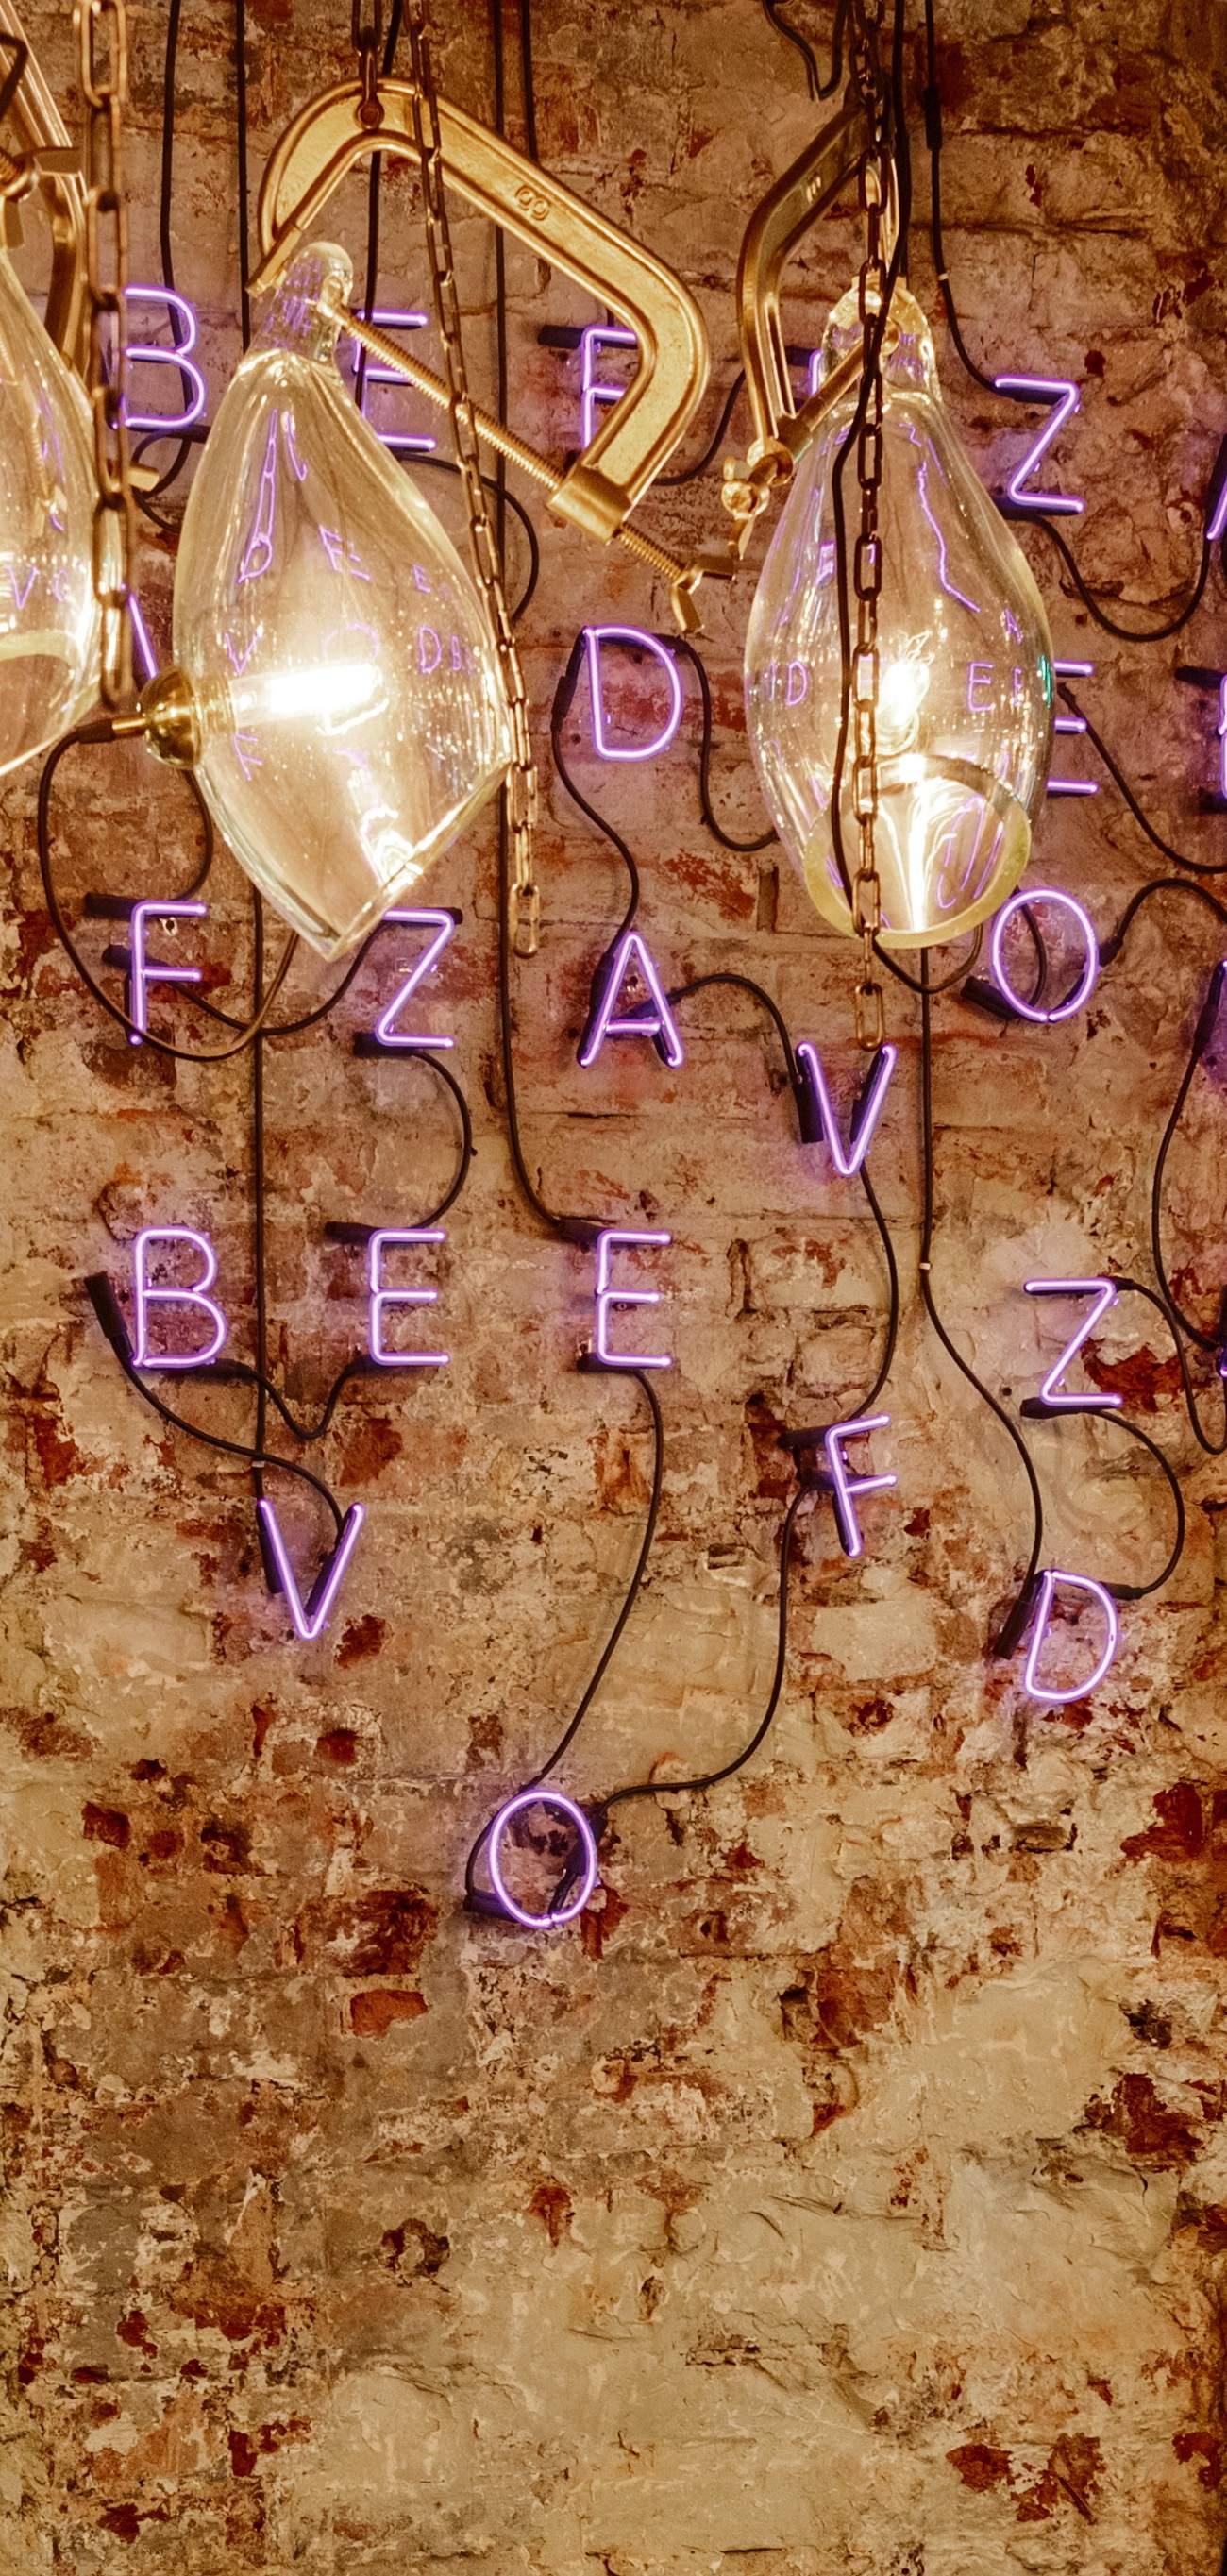 Ресторан «BeefZavod» в Санкт-Петербурге, Россия